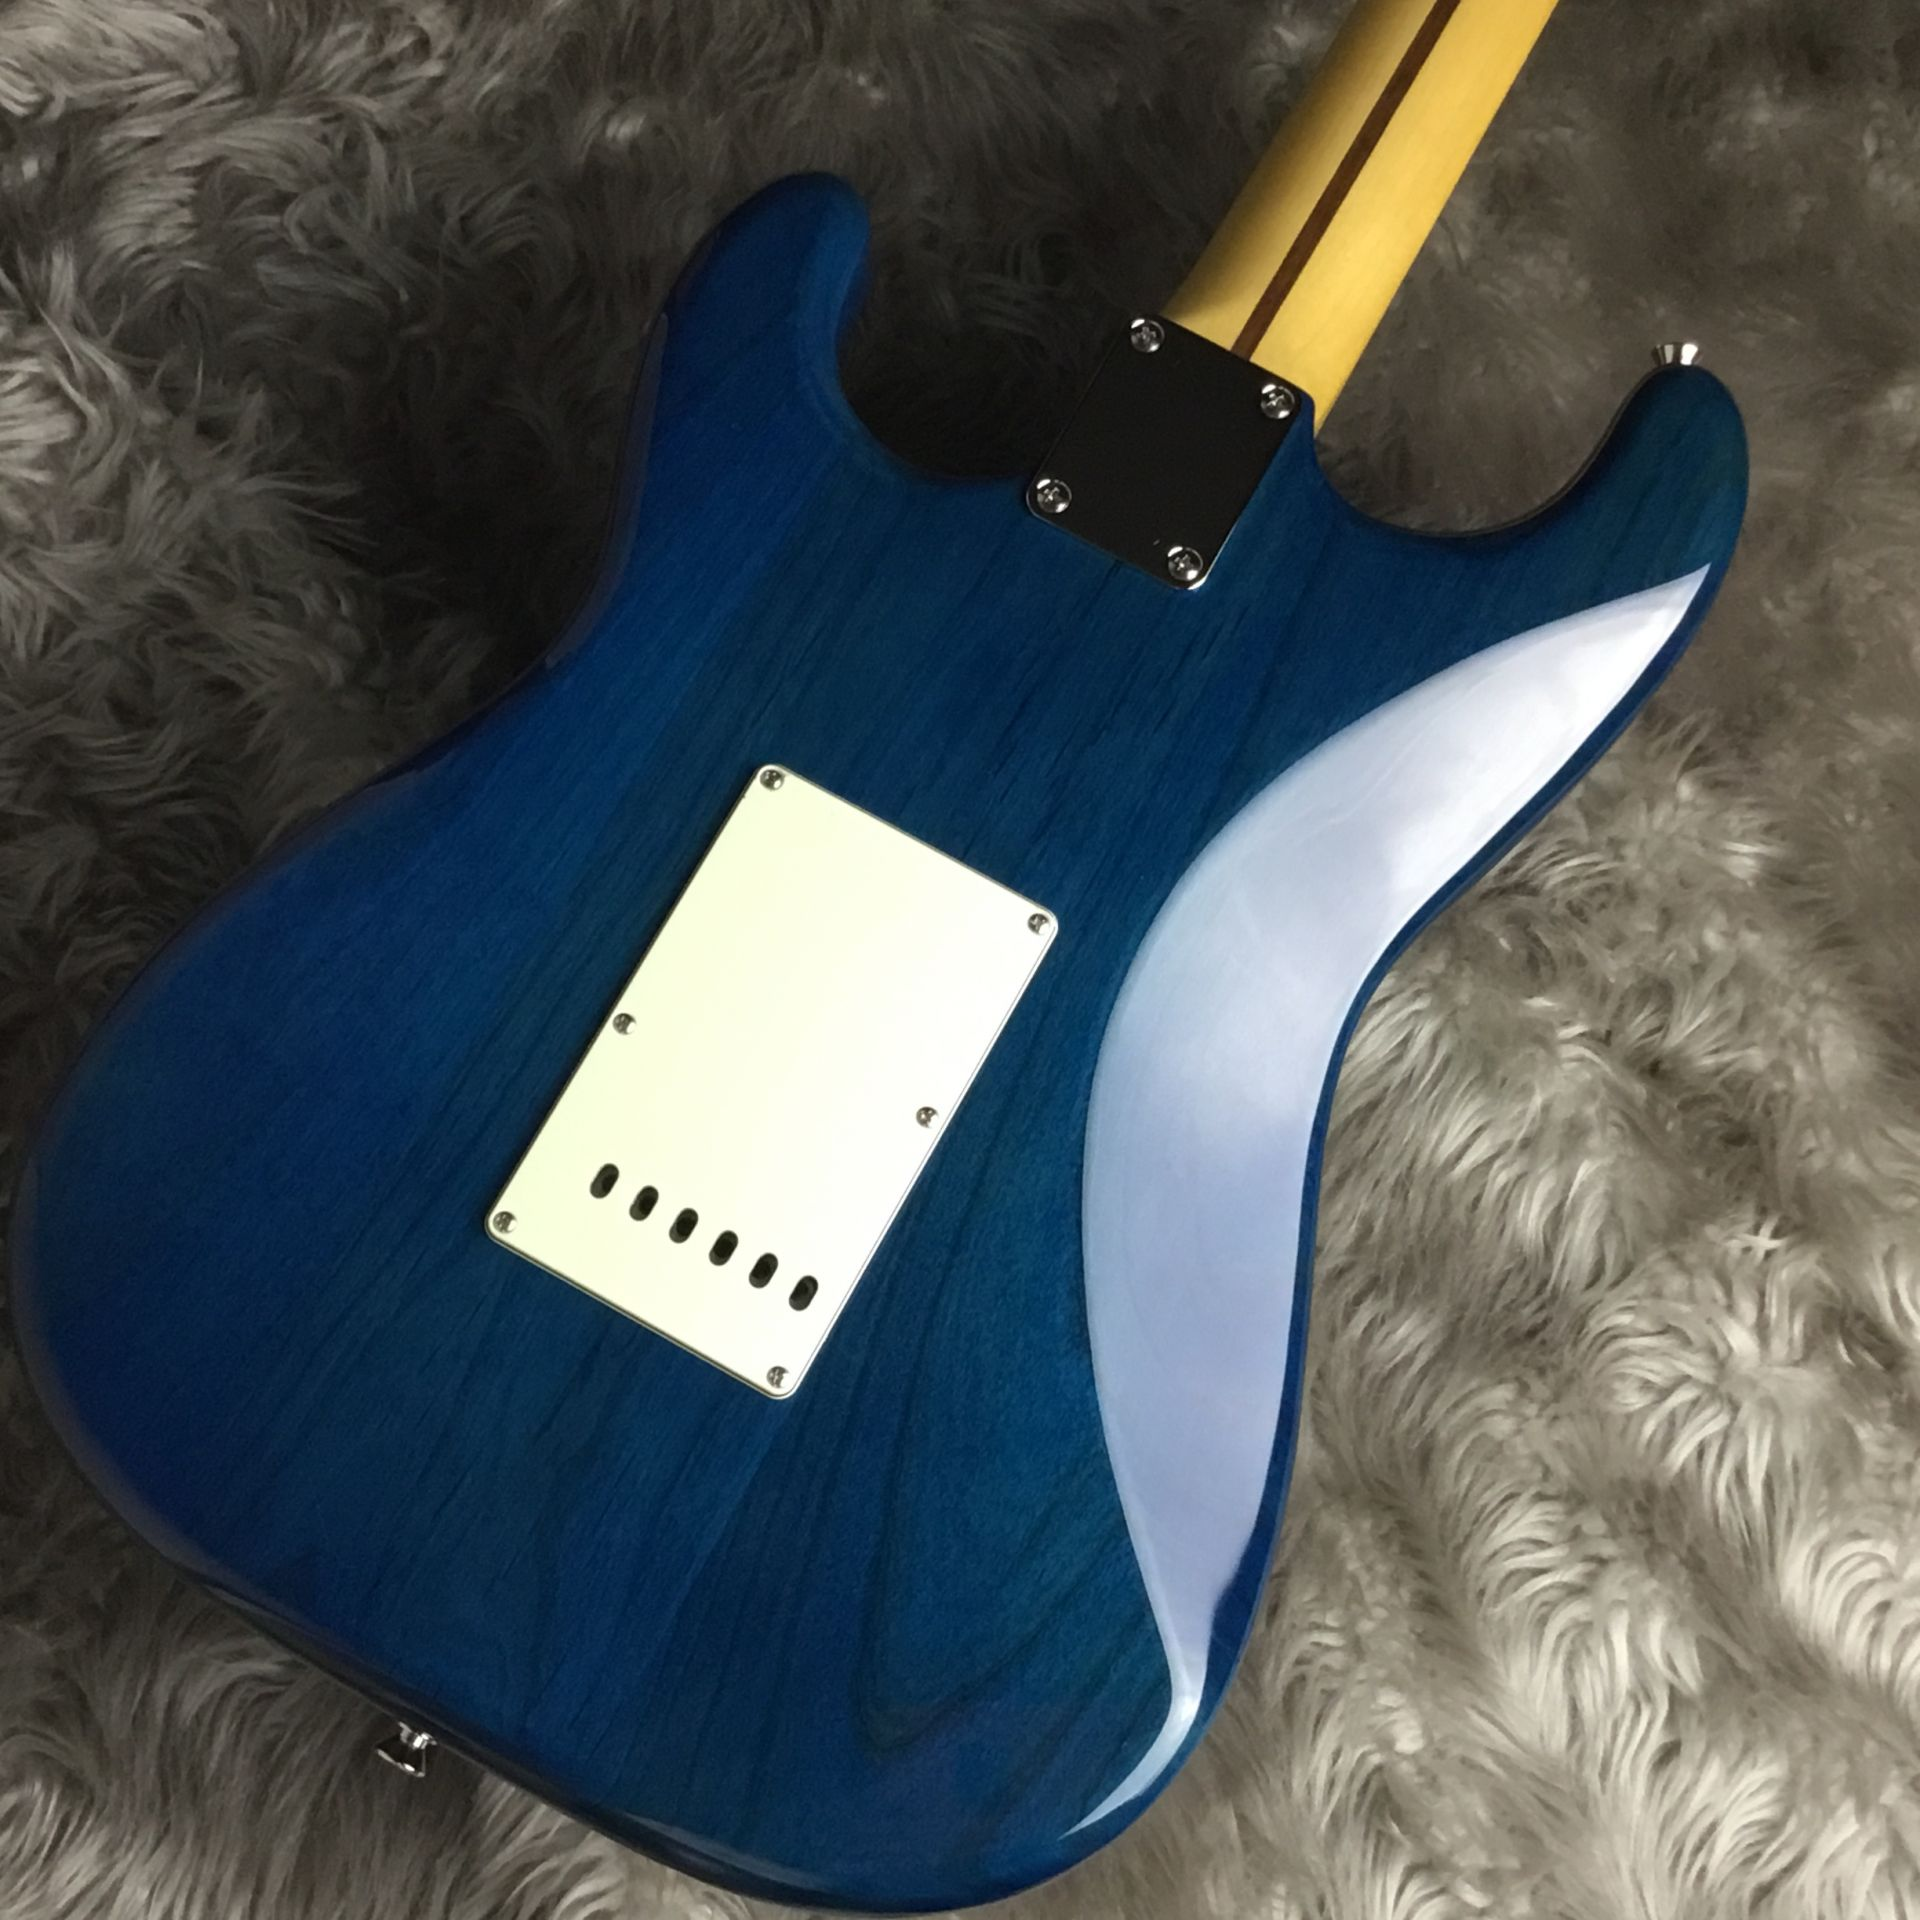 Hybrid 60s Stratocaster Quilt Top/Transparent Blueのヘッド画像